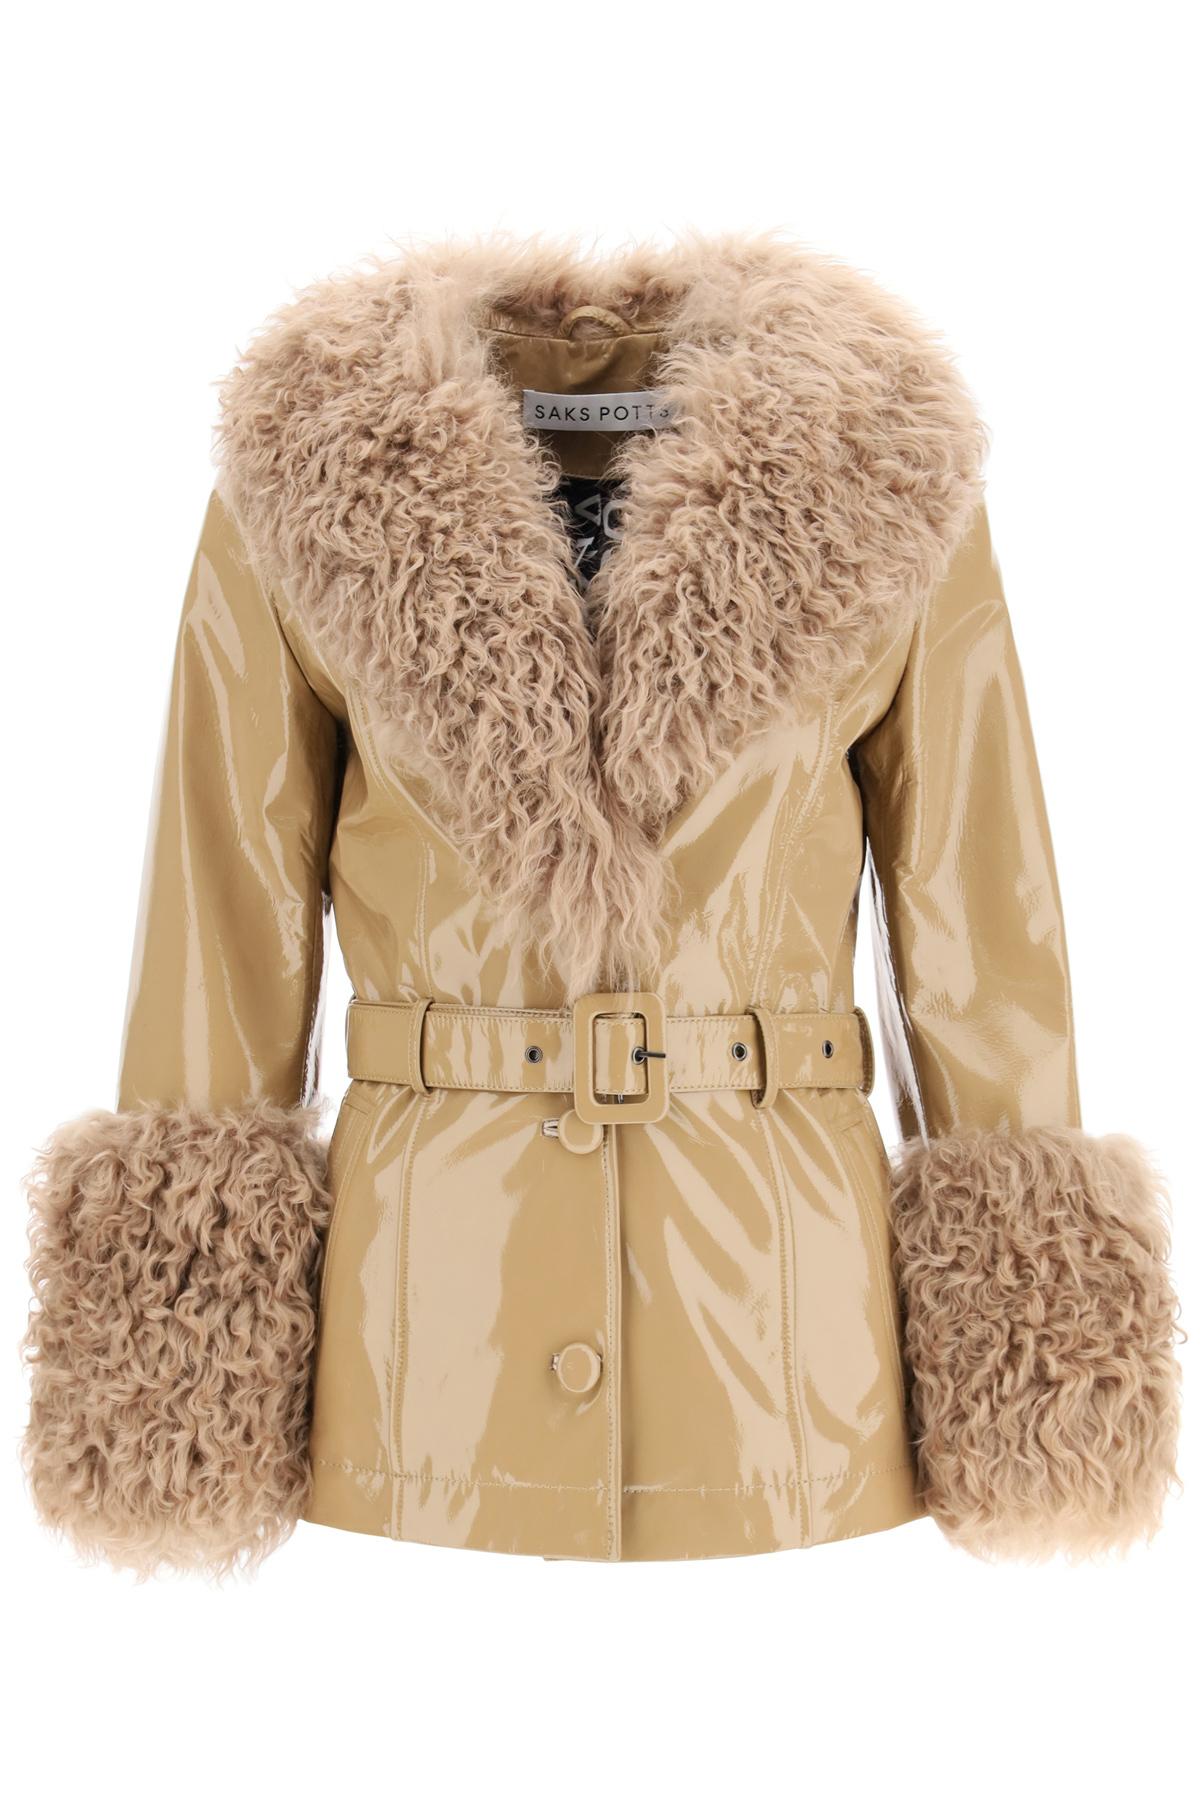 SAKS POTTS SHORTY JACKET IN SHINY LEATHER 2 Beige Leather, Fur